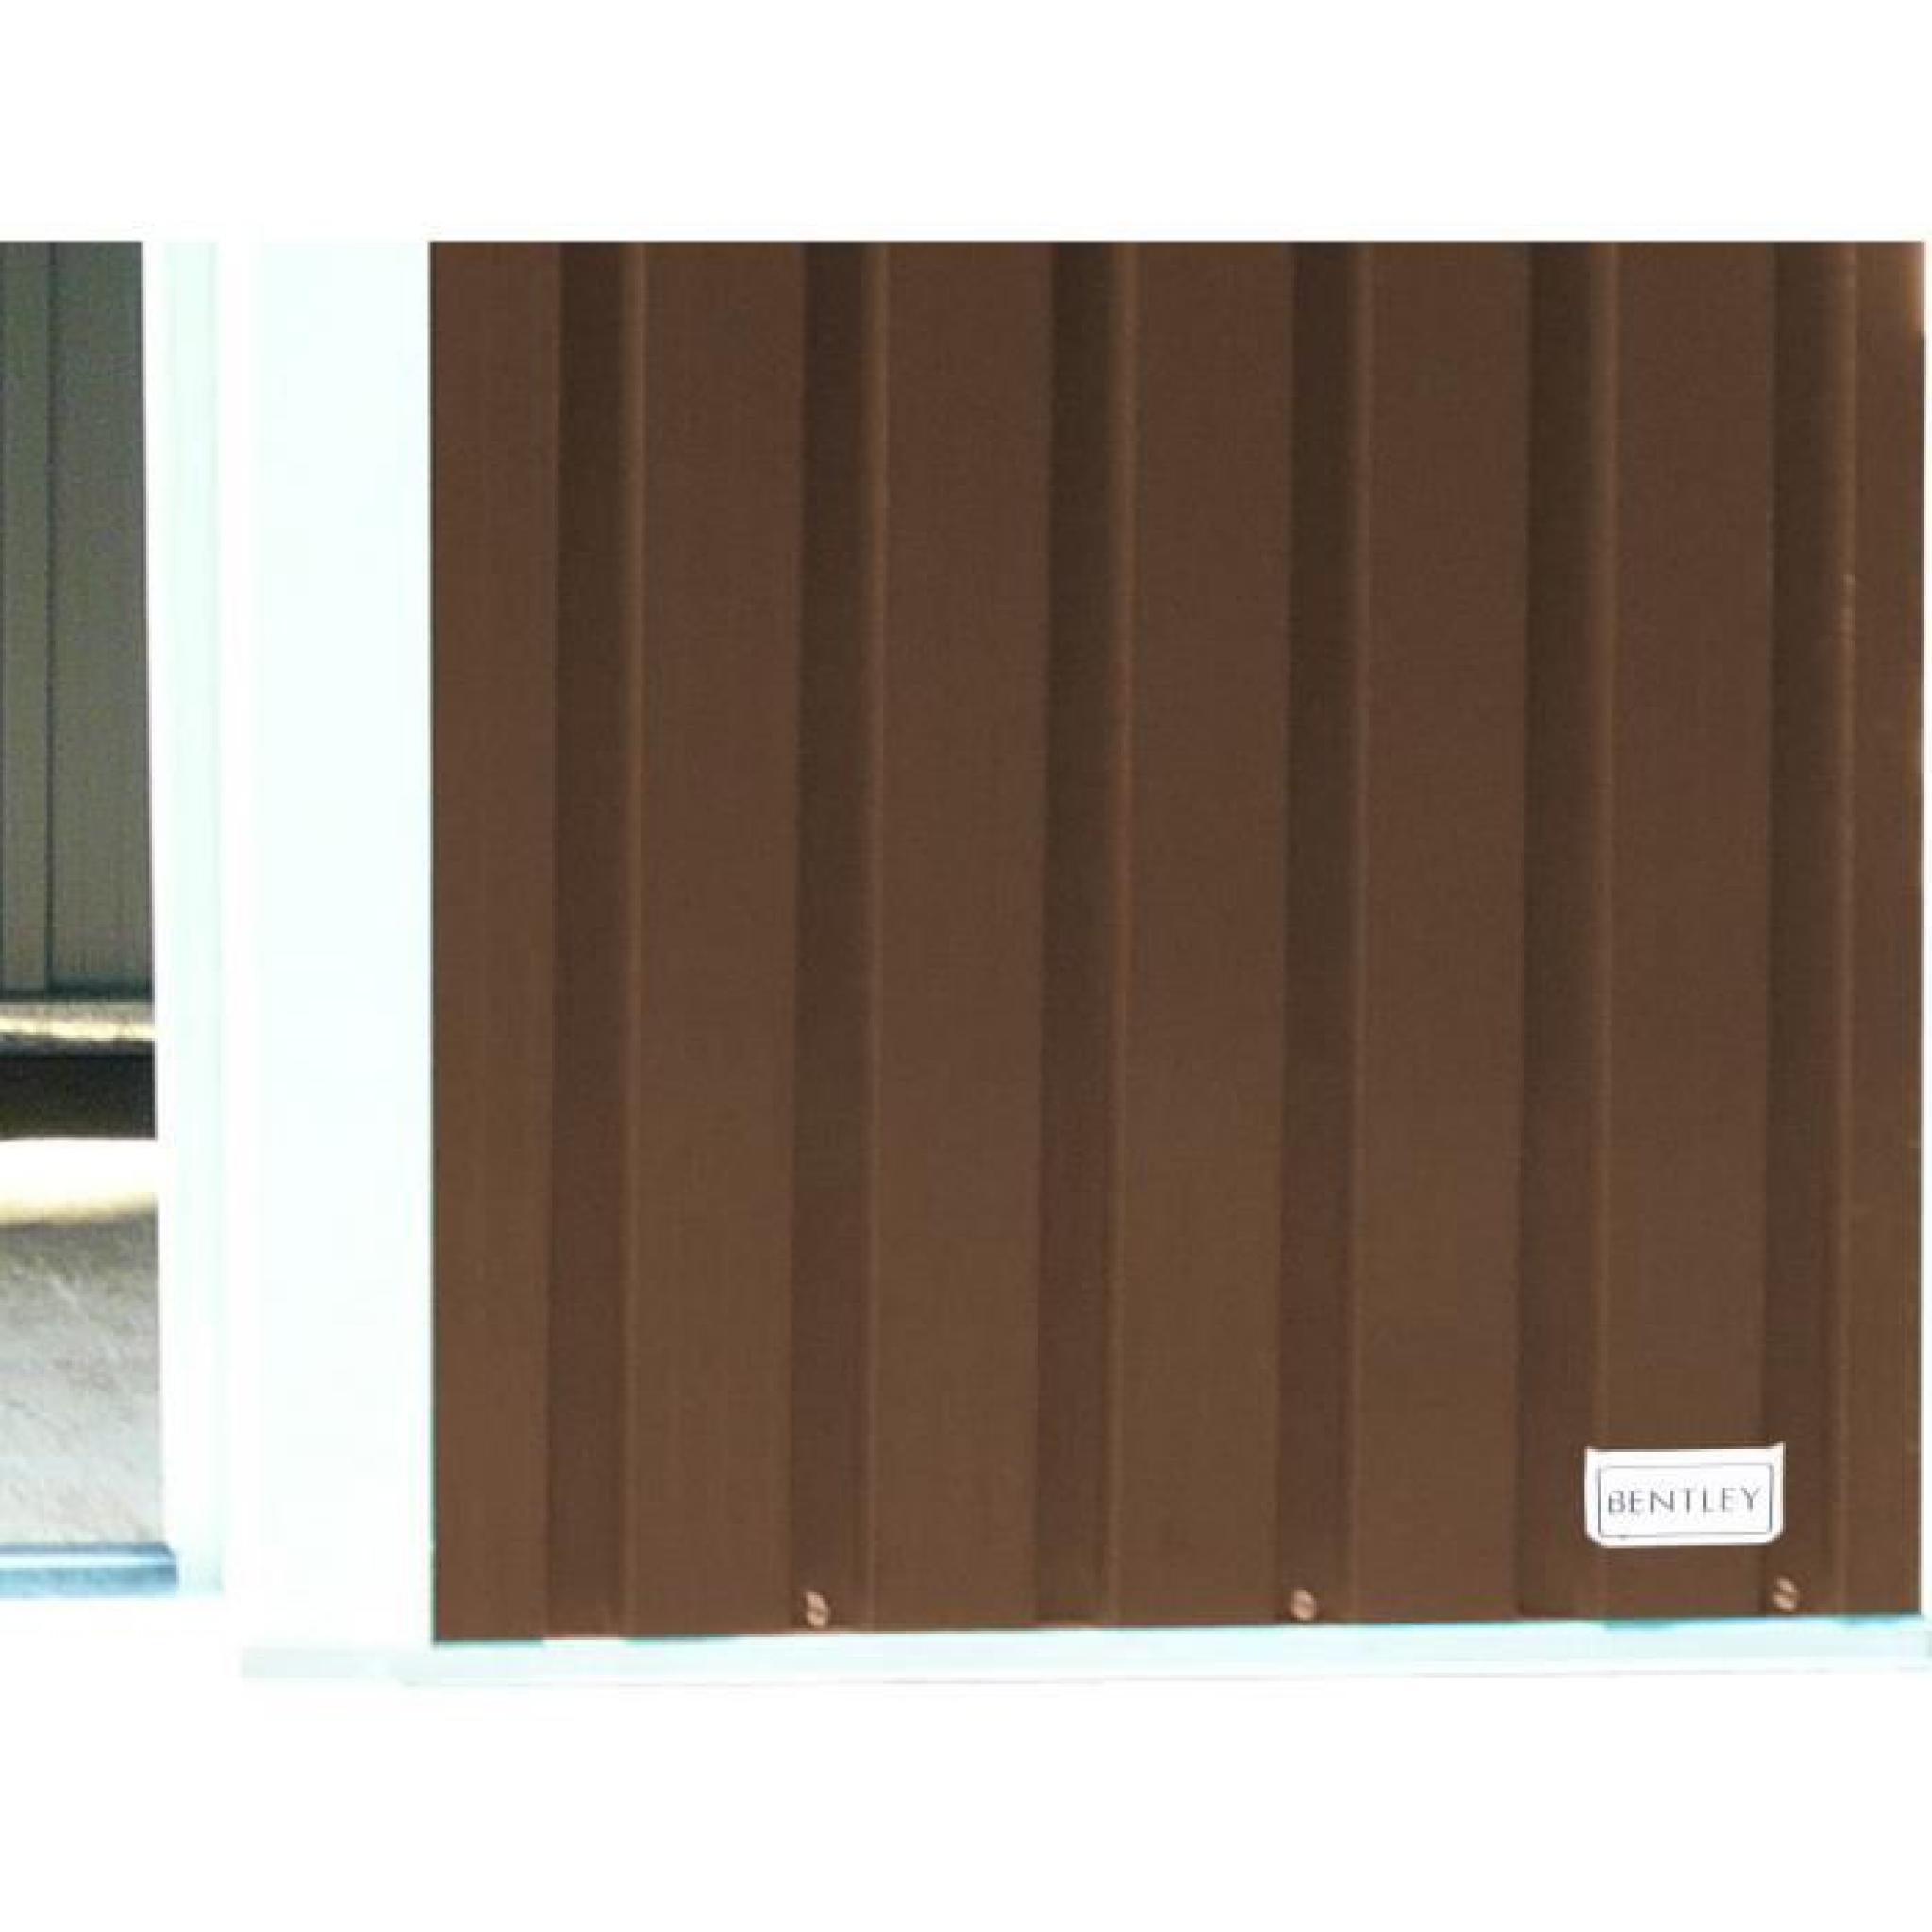 Bentley garden - Abri/remise de jardin - zinc/métal - marron - 2,4 x ...